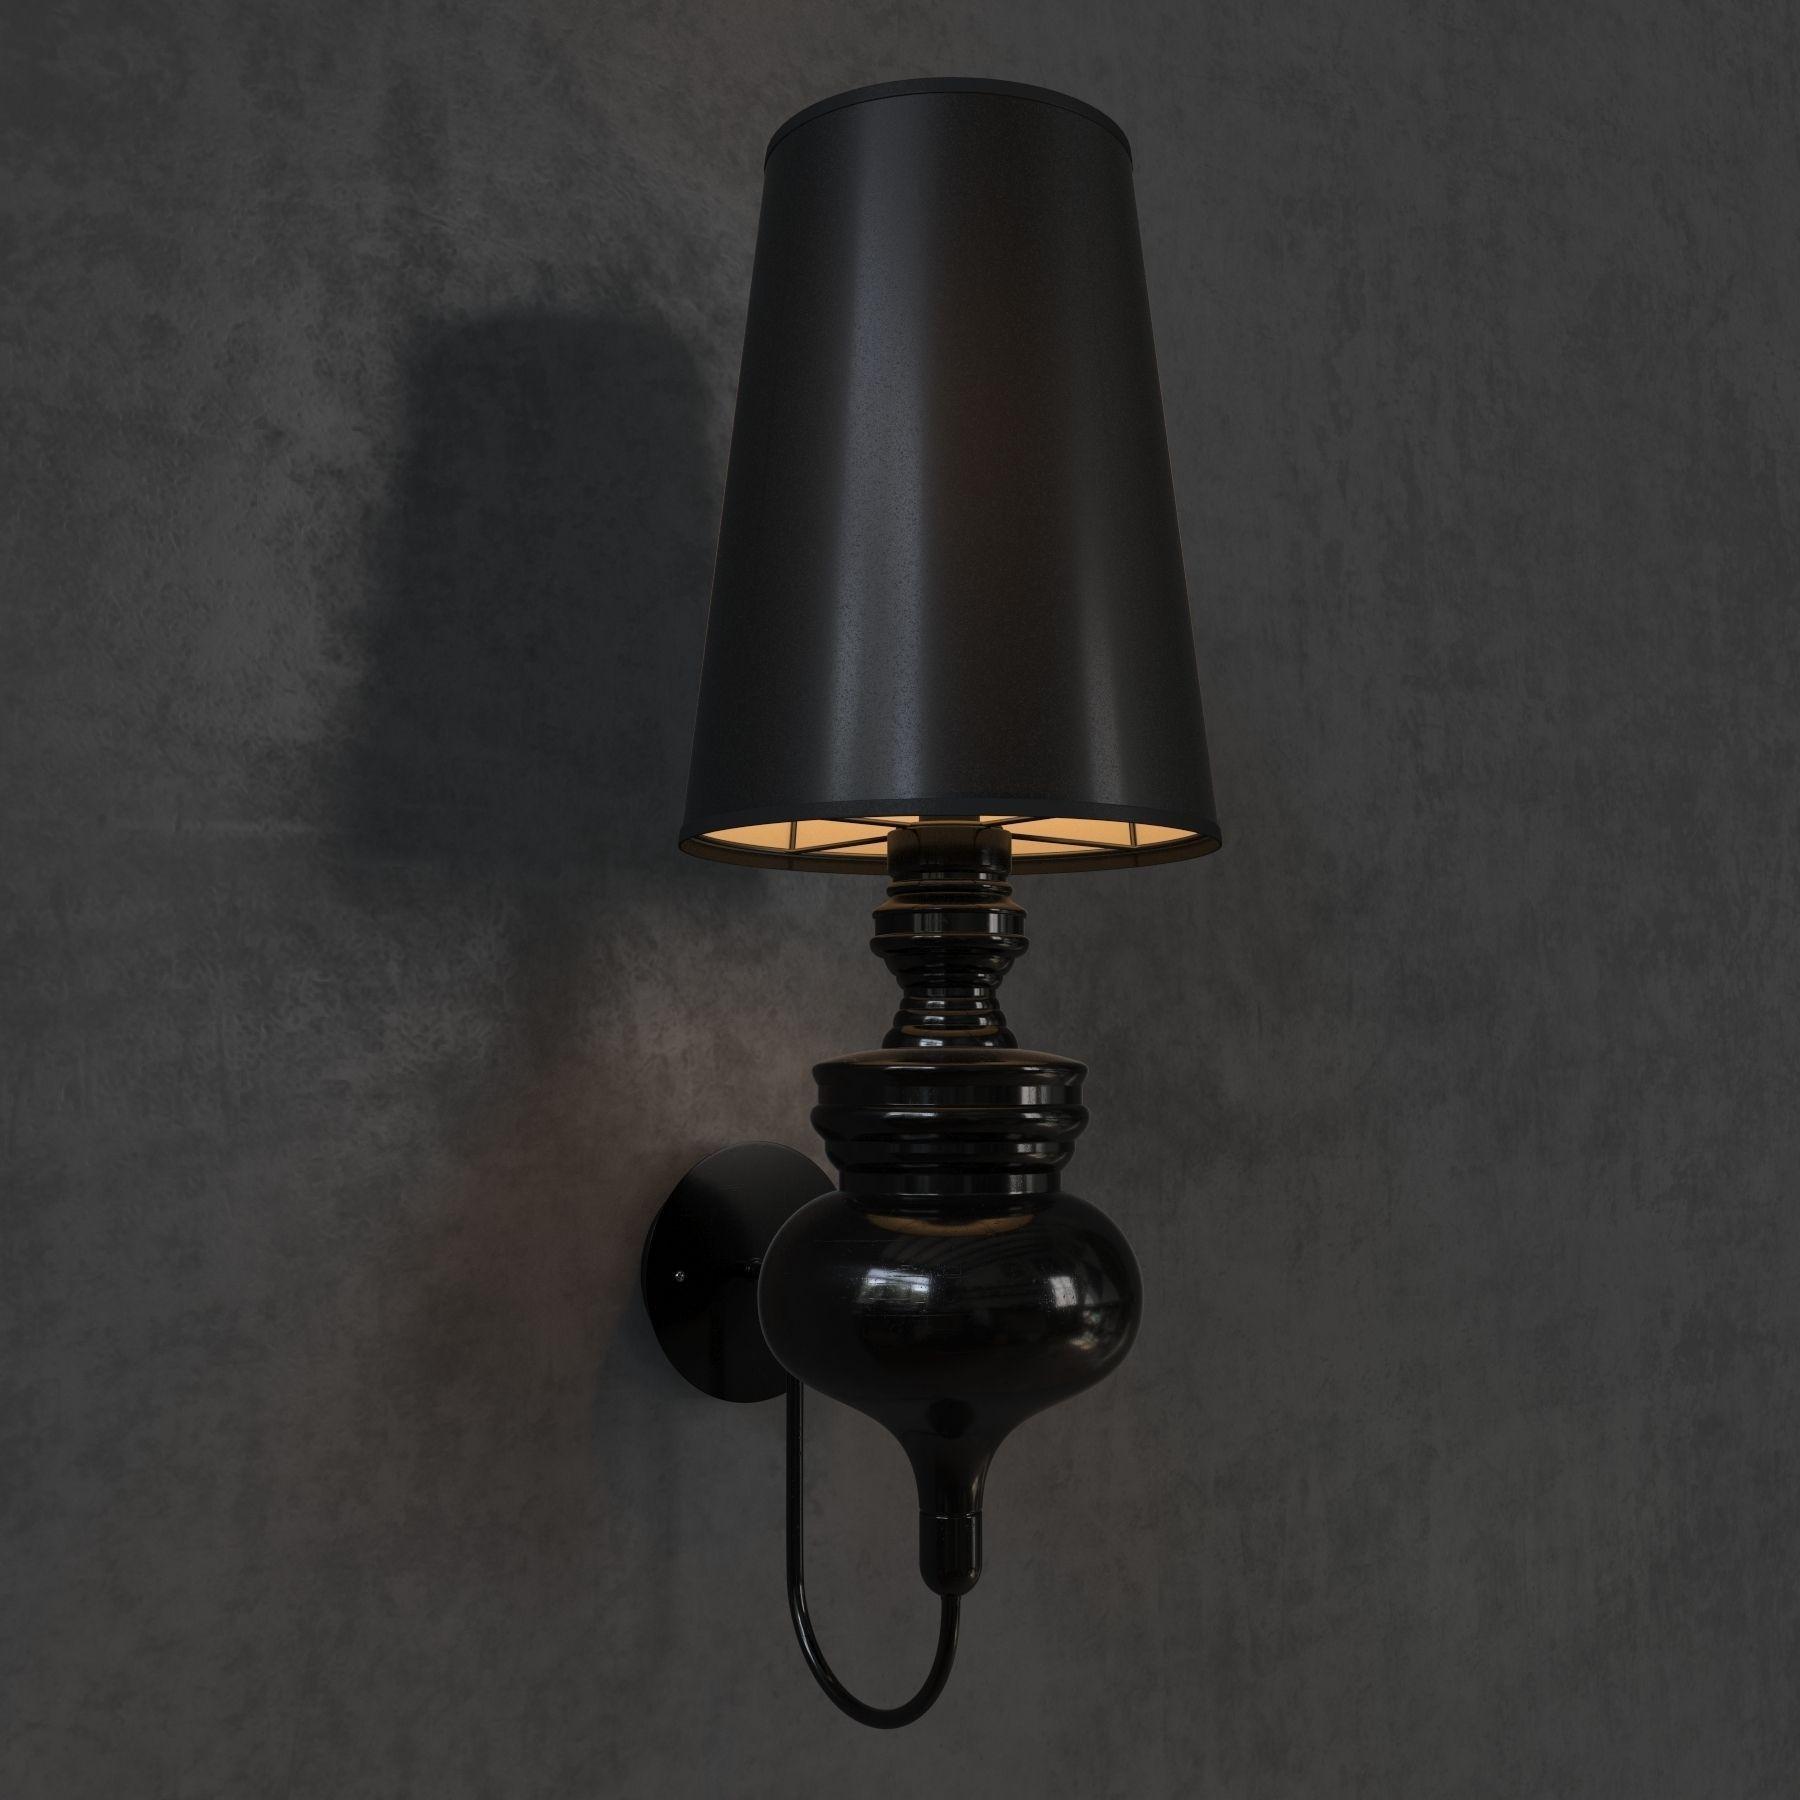 Wall Lamps 3d Model : Josephine Wall Lamp 3D Model MAX OBJ FBX MAT CGTrader.com